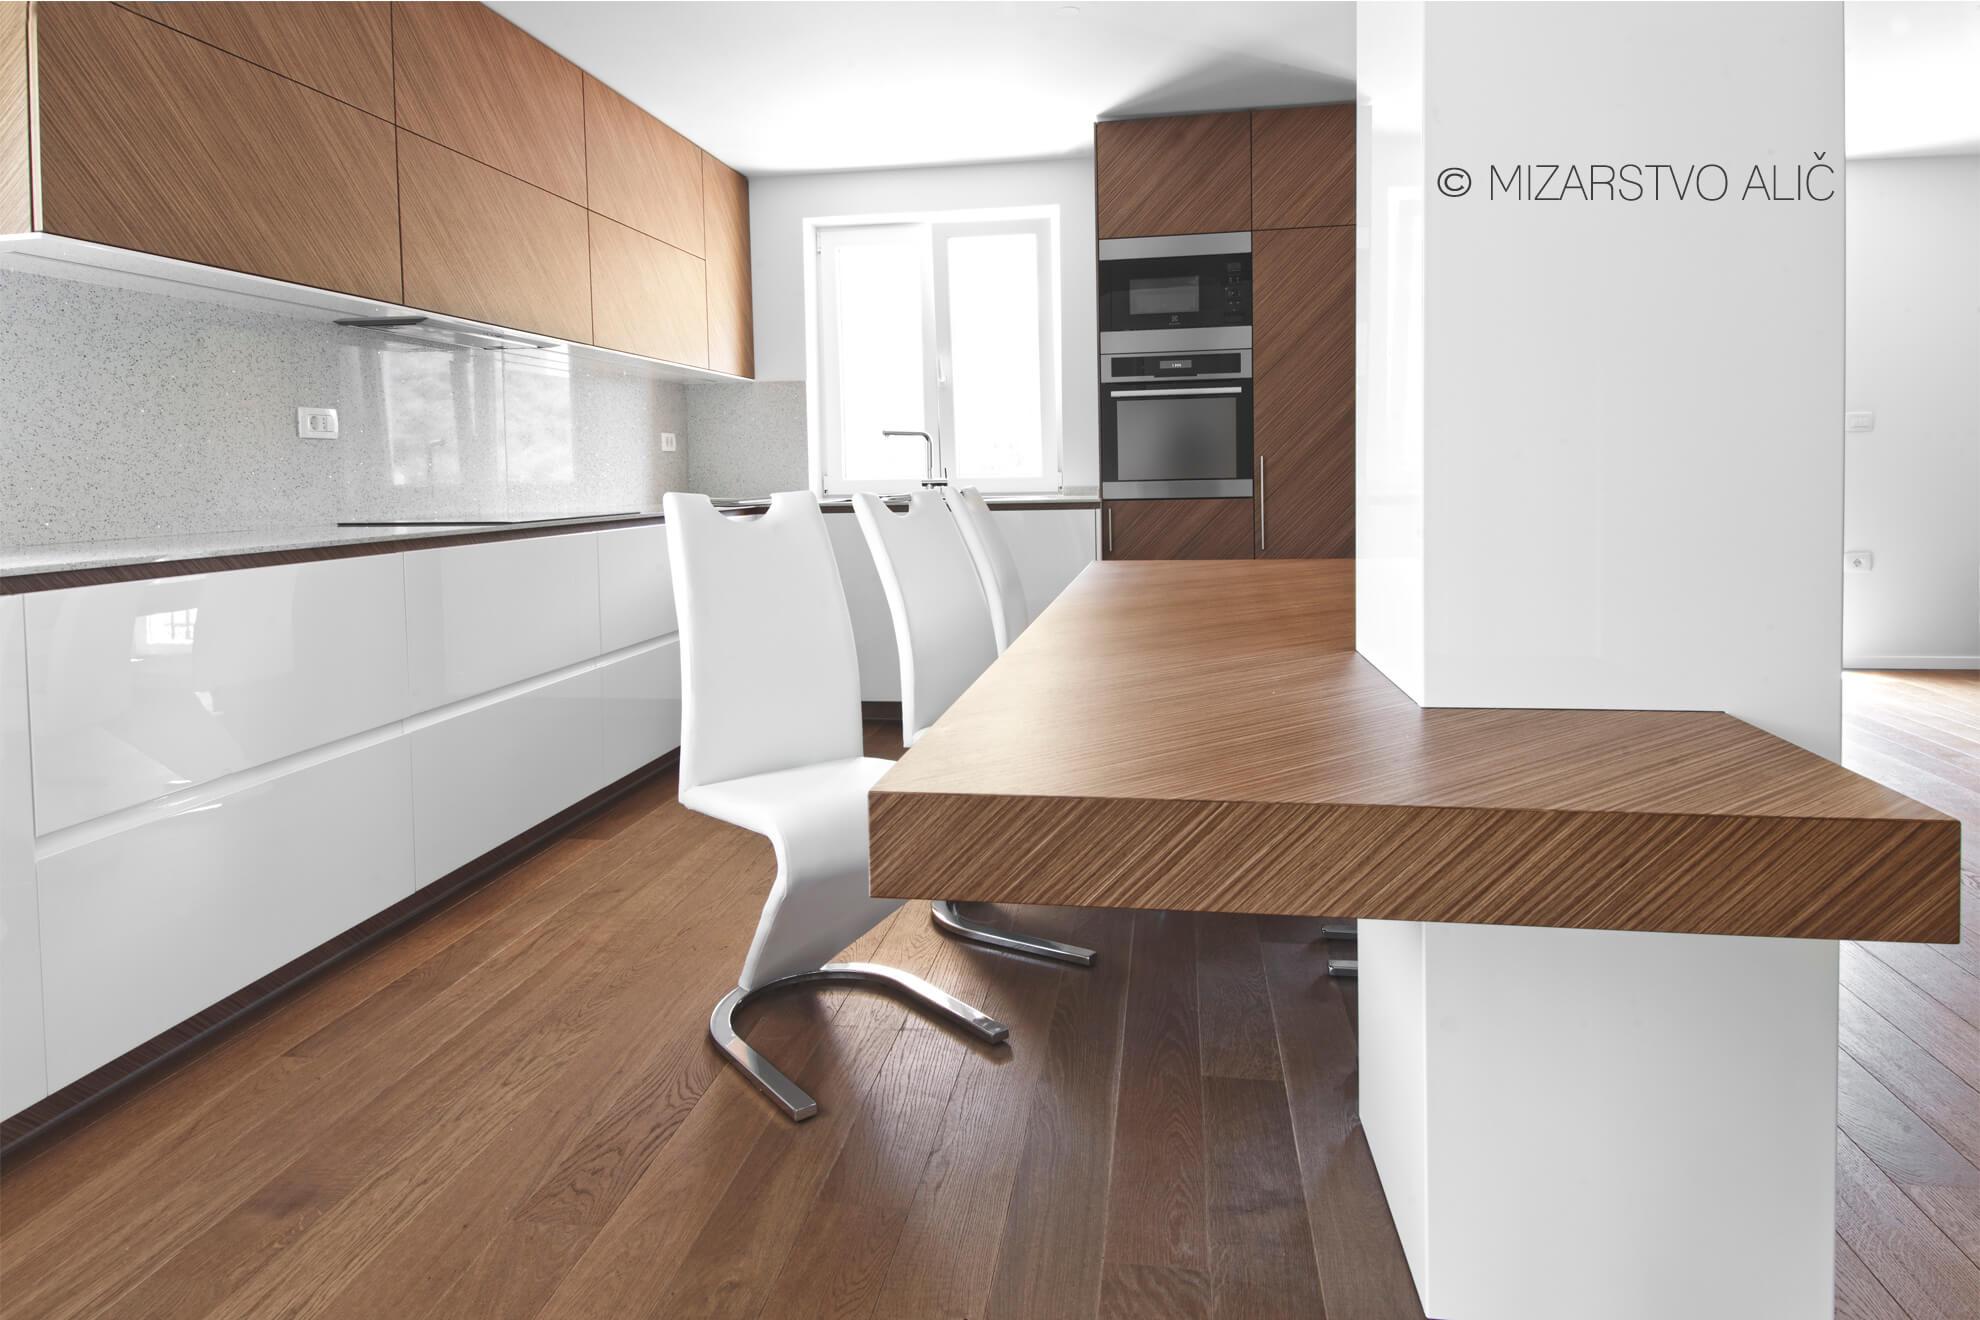 Furnirano kuhinjsko pohištvo po meri